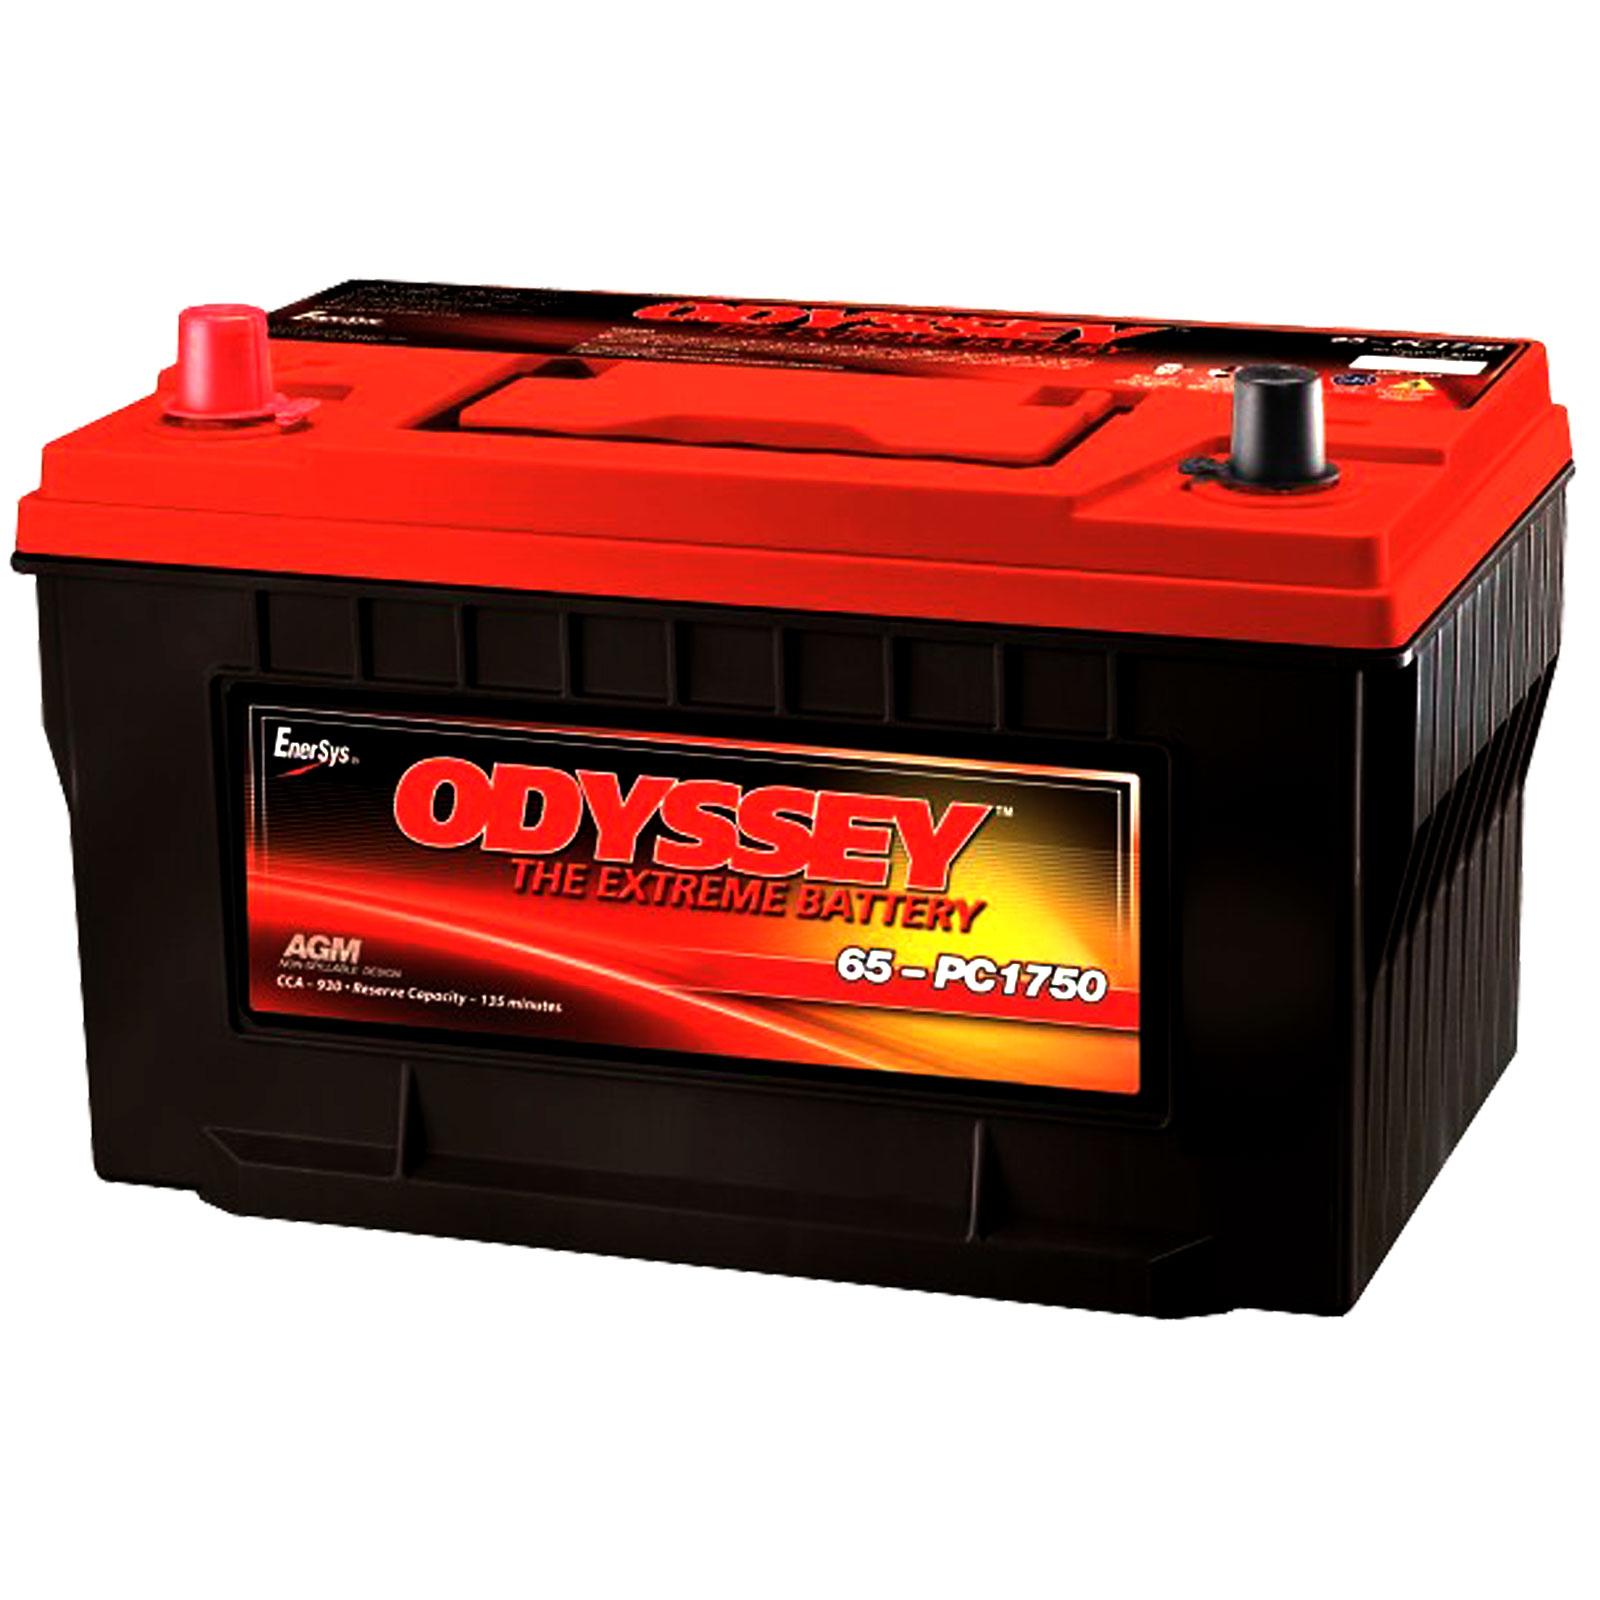 Odyssey Extreme PC1750/65 950CCA Sealed AGM Automotive